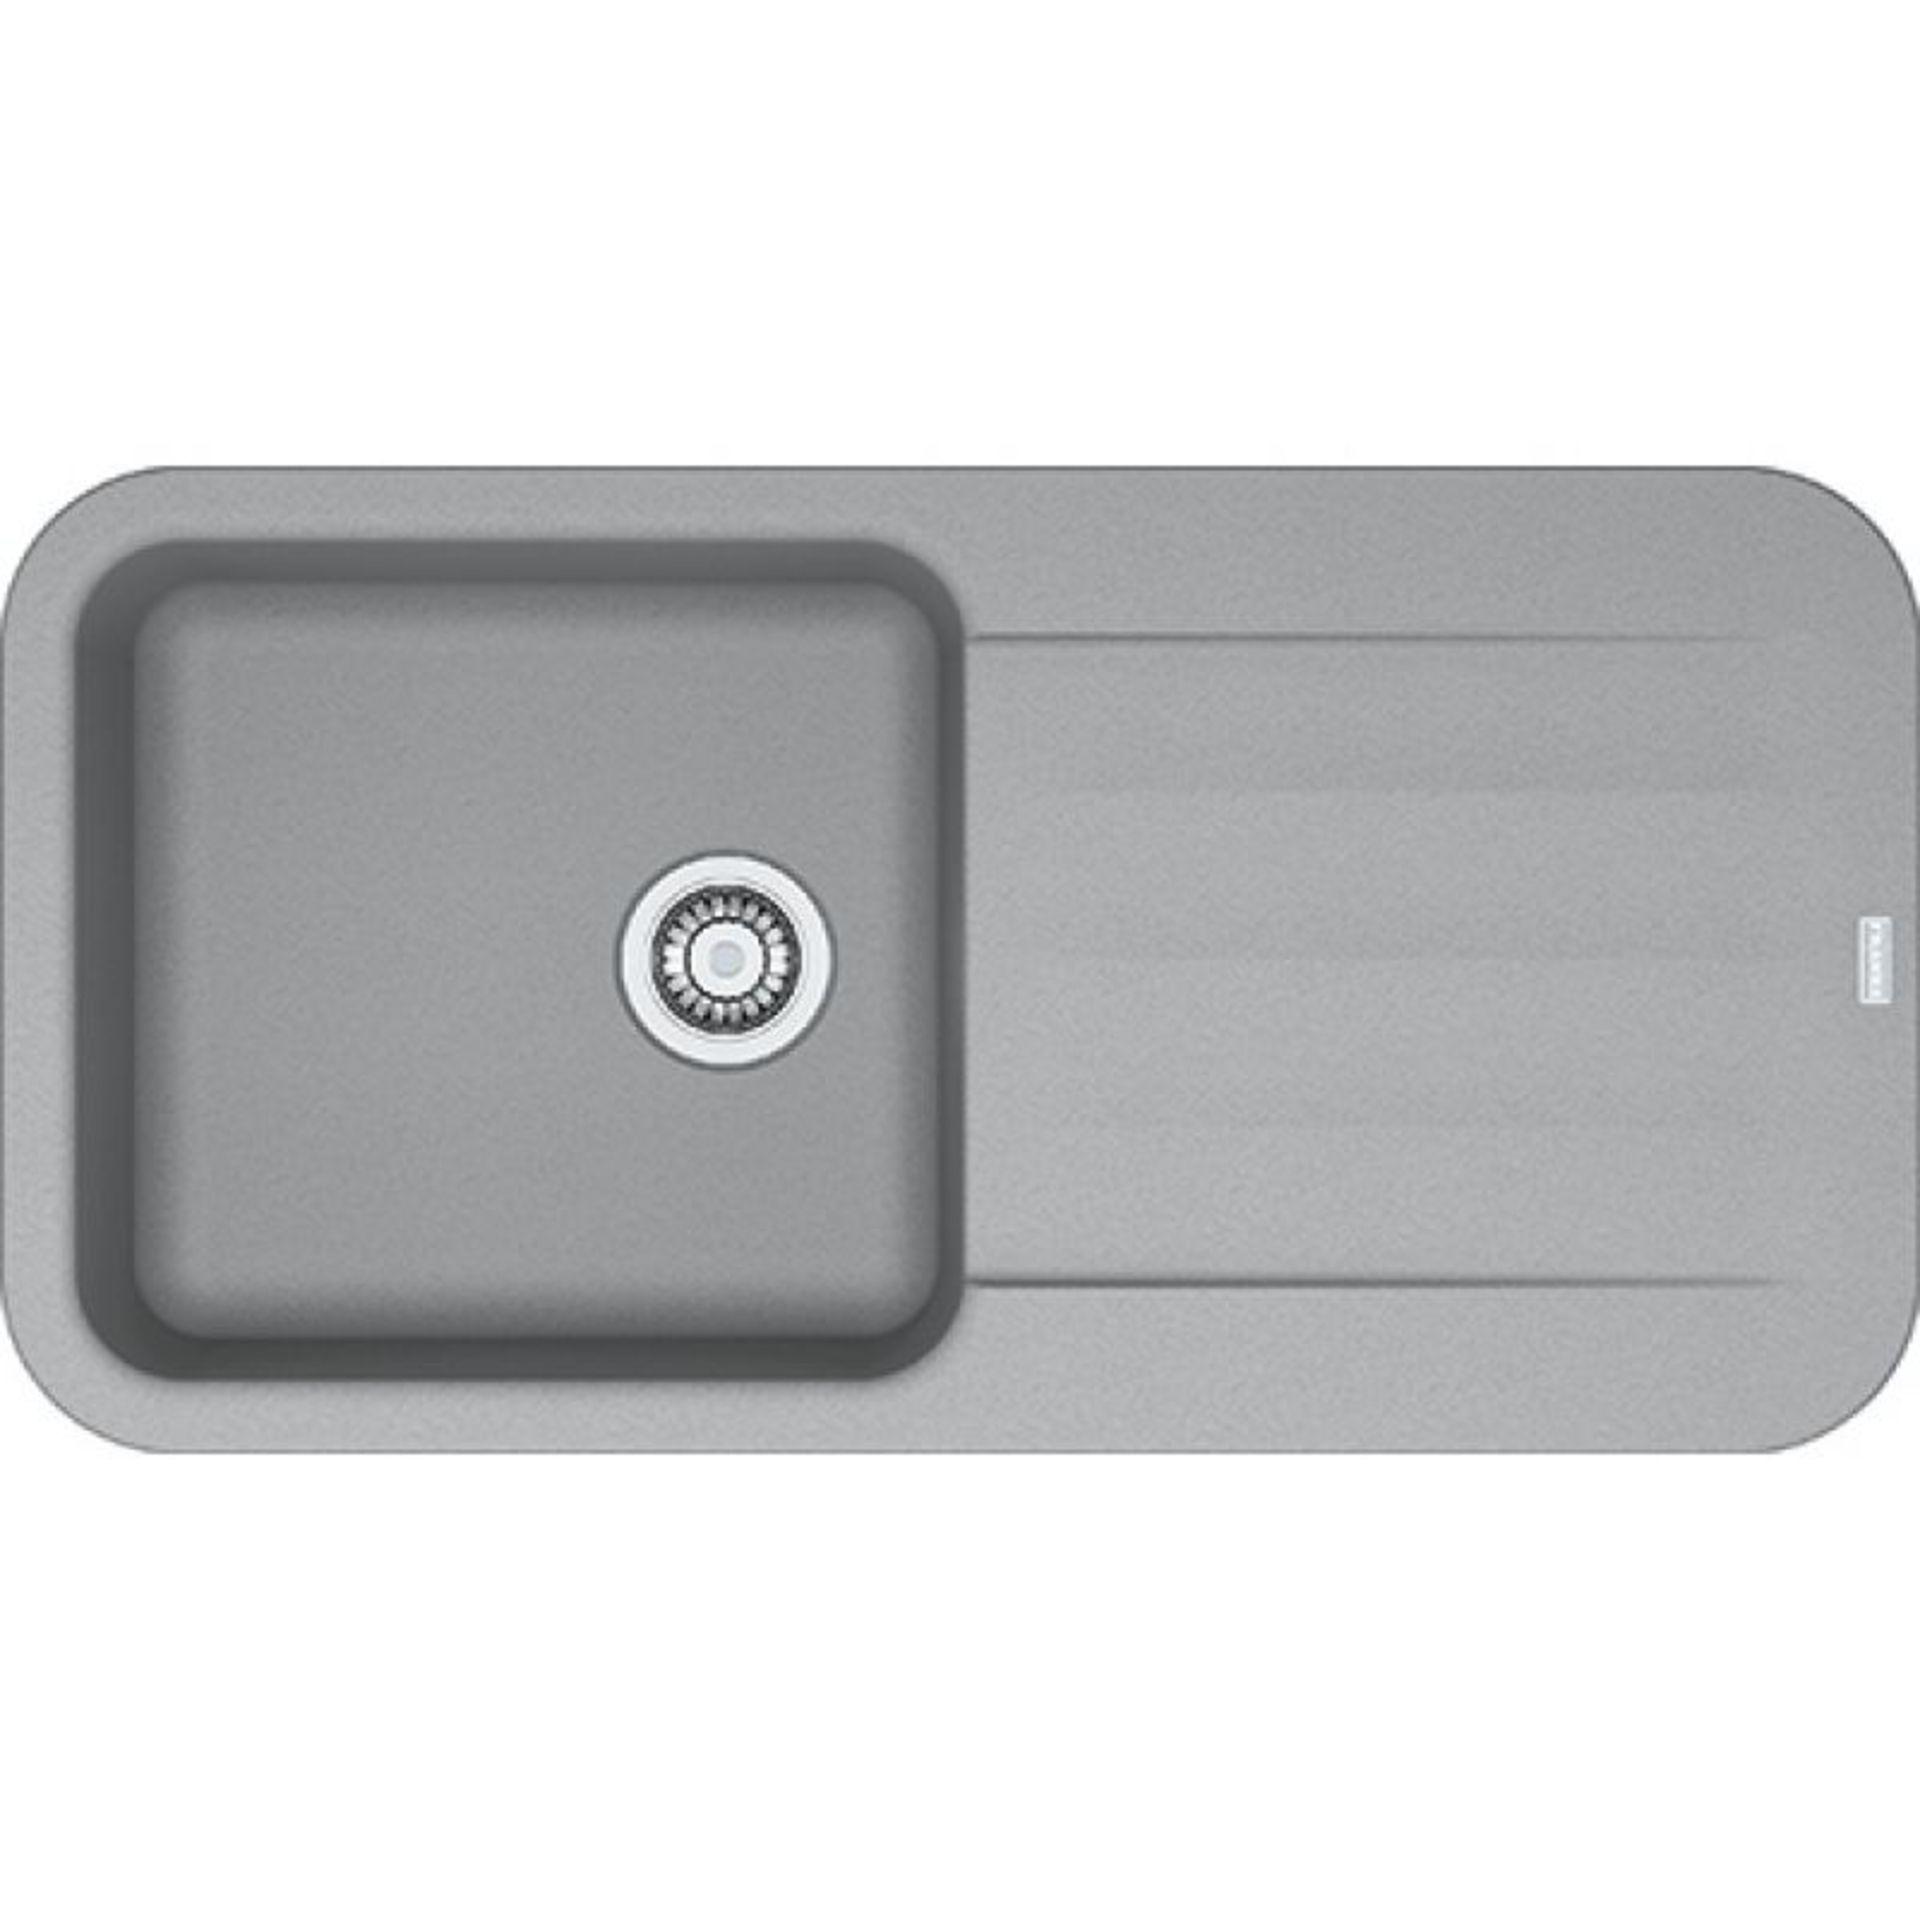 NEW (REF6) 2 x Franke Pebel Reversible Inset 1 Bowl Drainer Fragranite Sink Stone Grey. RRP £329.56.